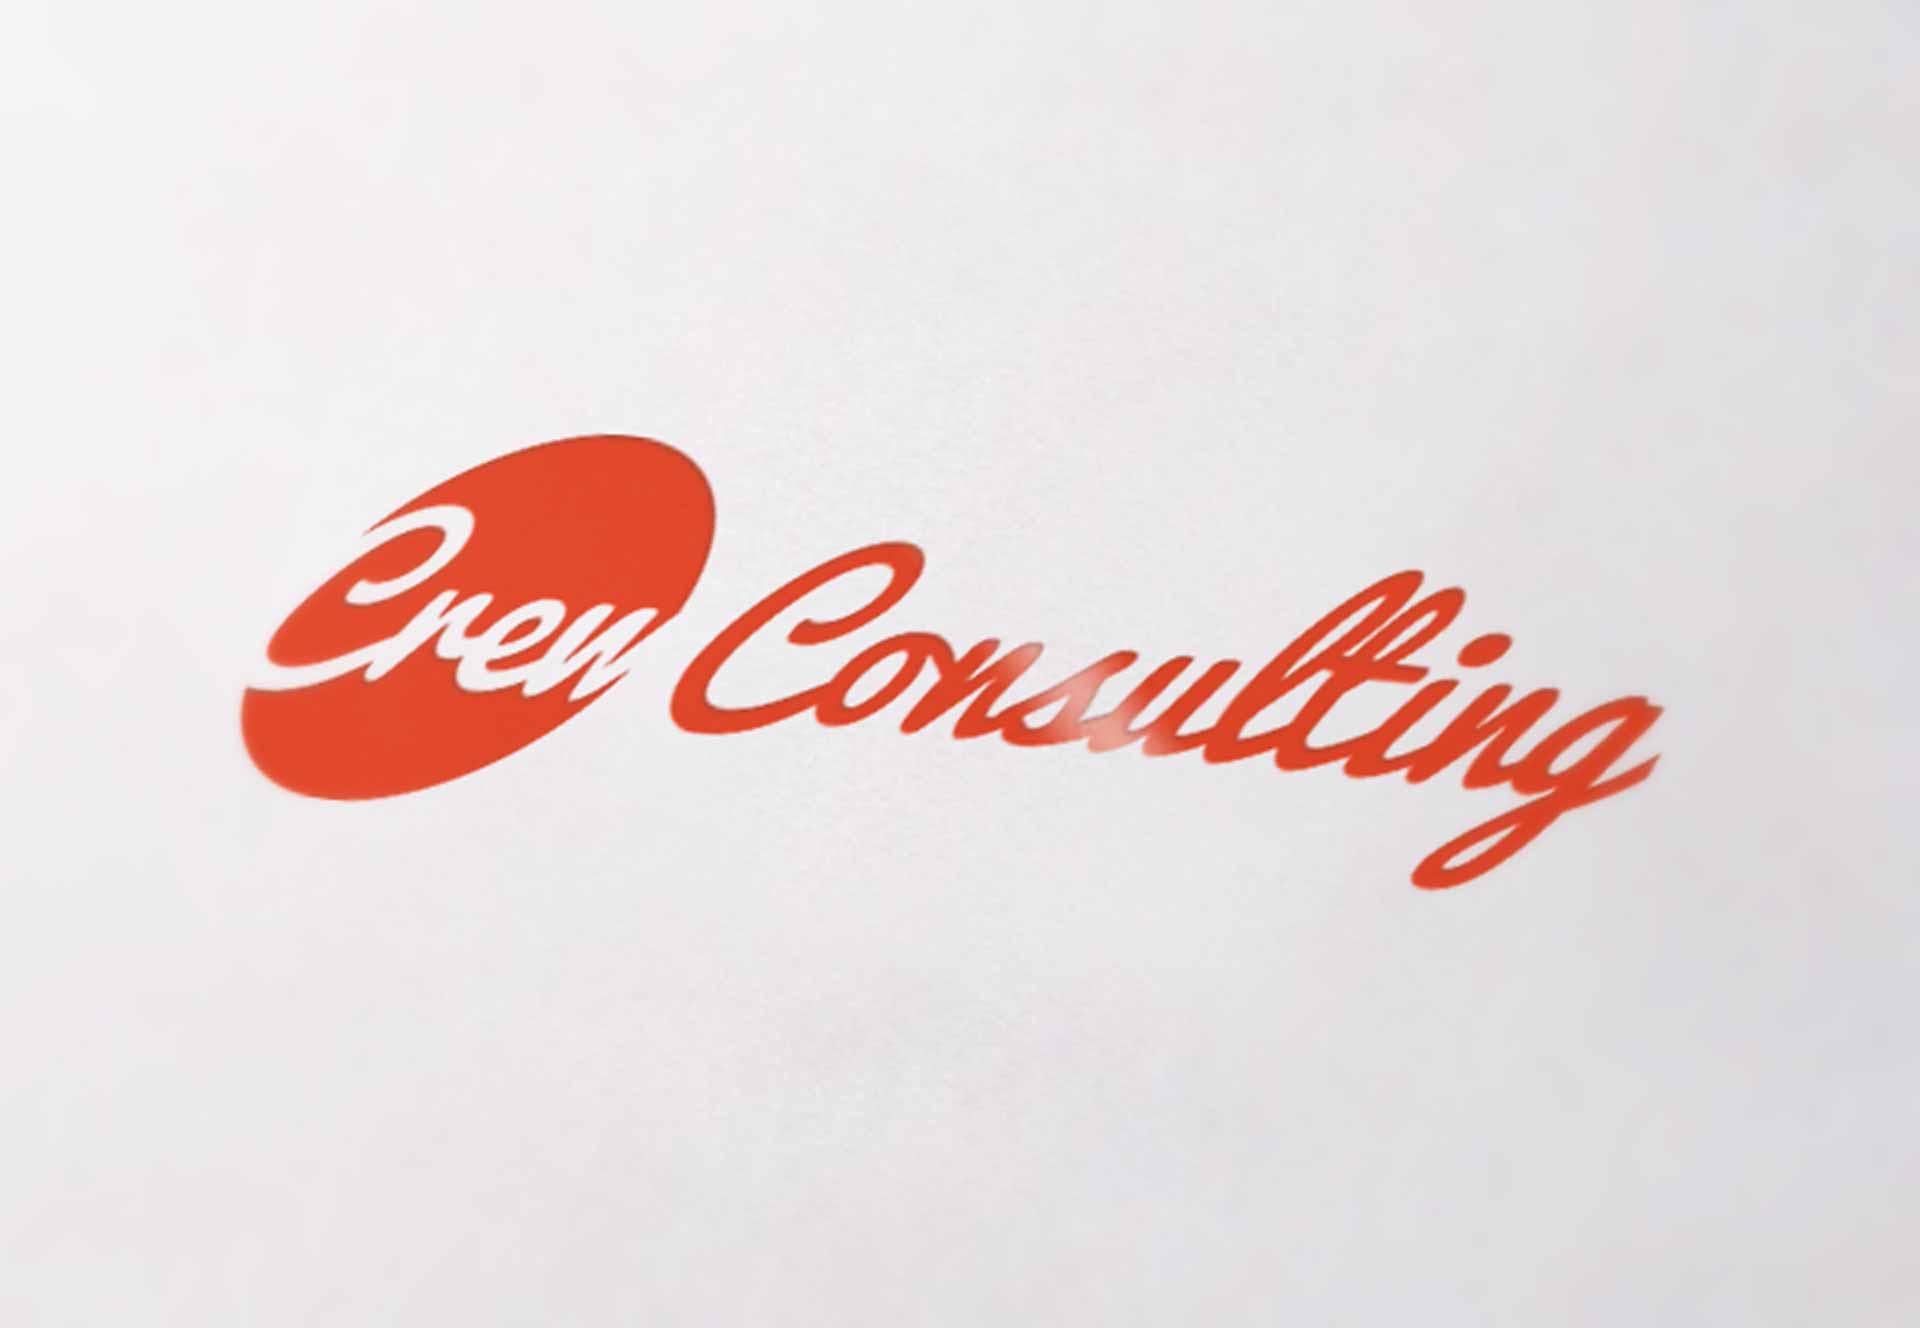 Crew Consulting Logo Mockup